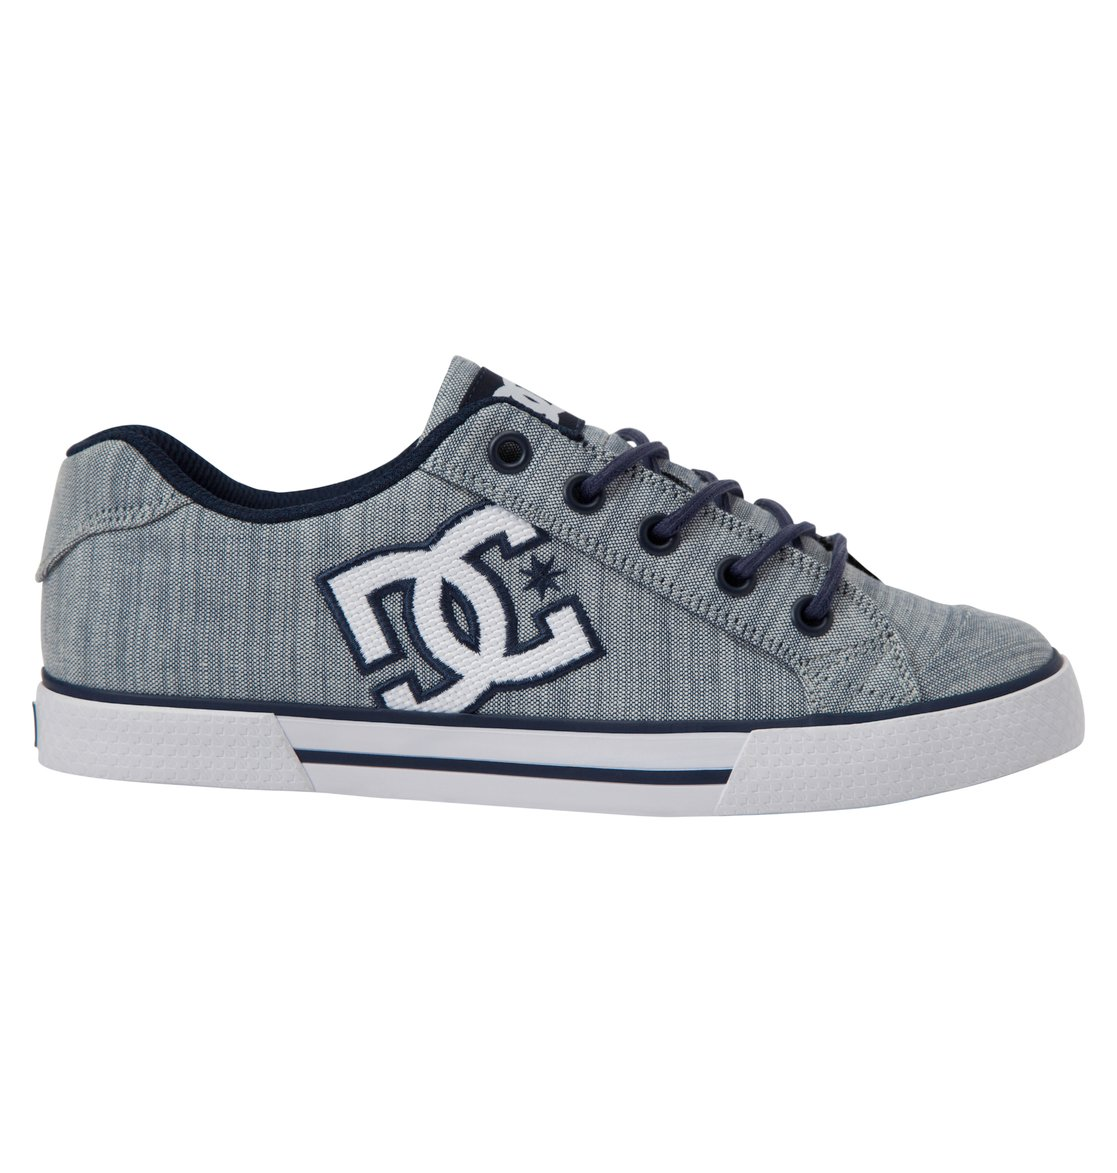 b8af6257bcaff 0 Chelsea TX SE - Shoes for Women ADJS300025 DC Shoes